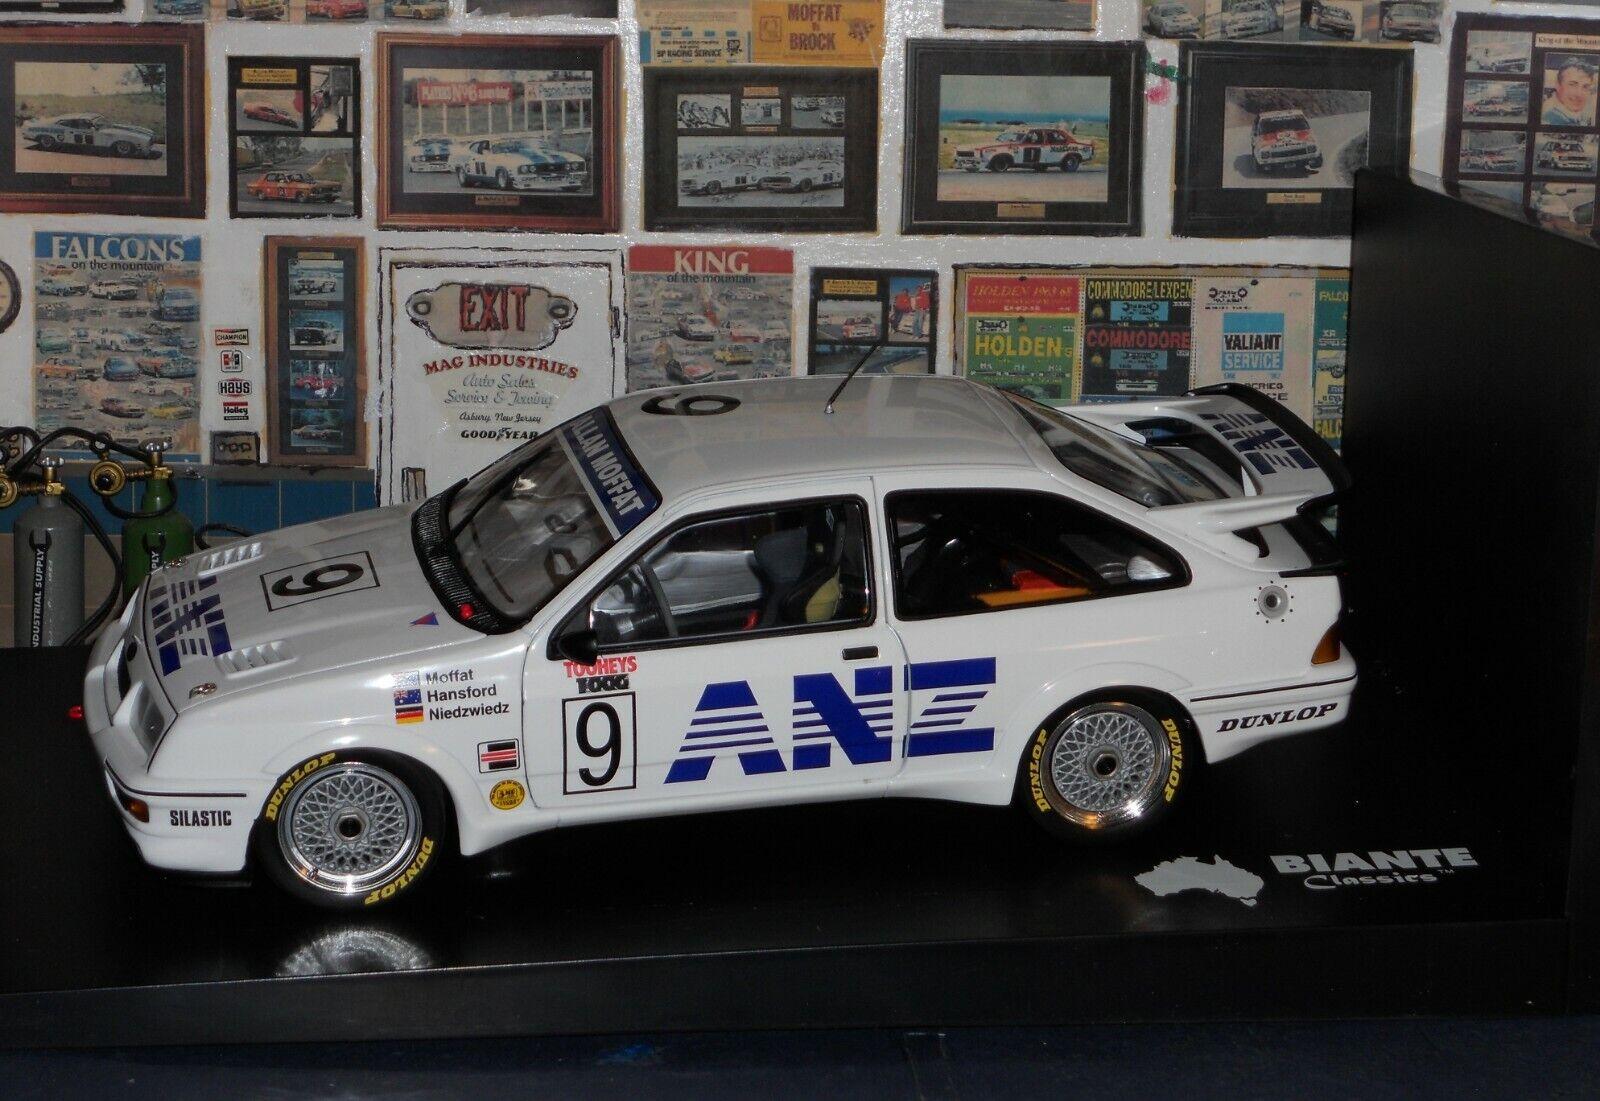 1 18 BIANTE FORD SIERRA RS500  ANZ  9 1988 BATHURST MOFFAT HANSFORD NIEDZWIEDZ